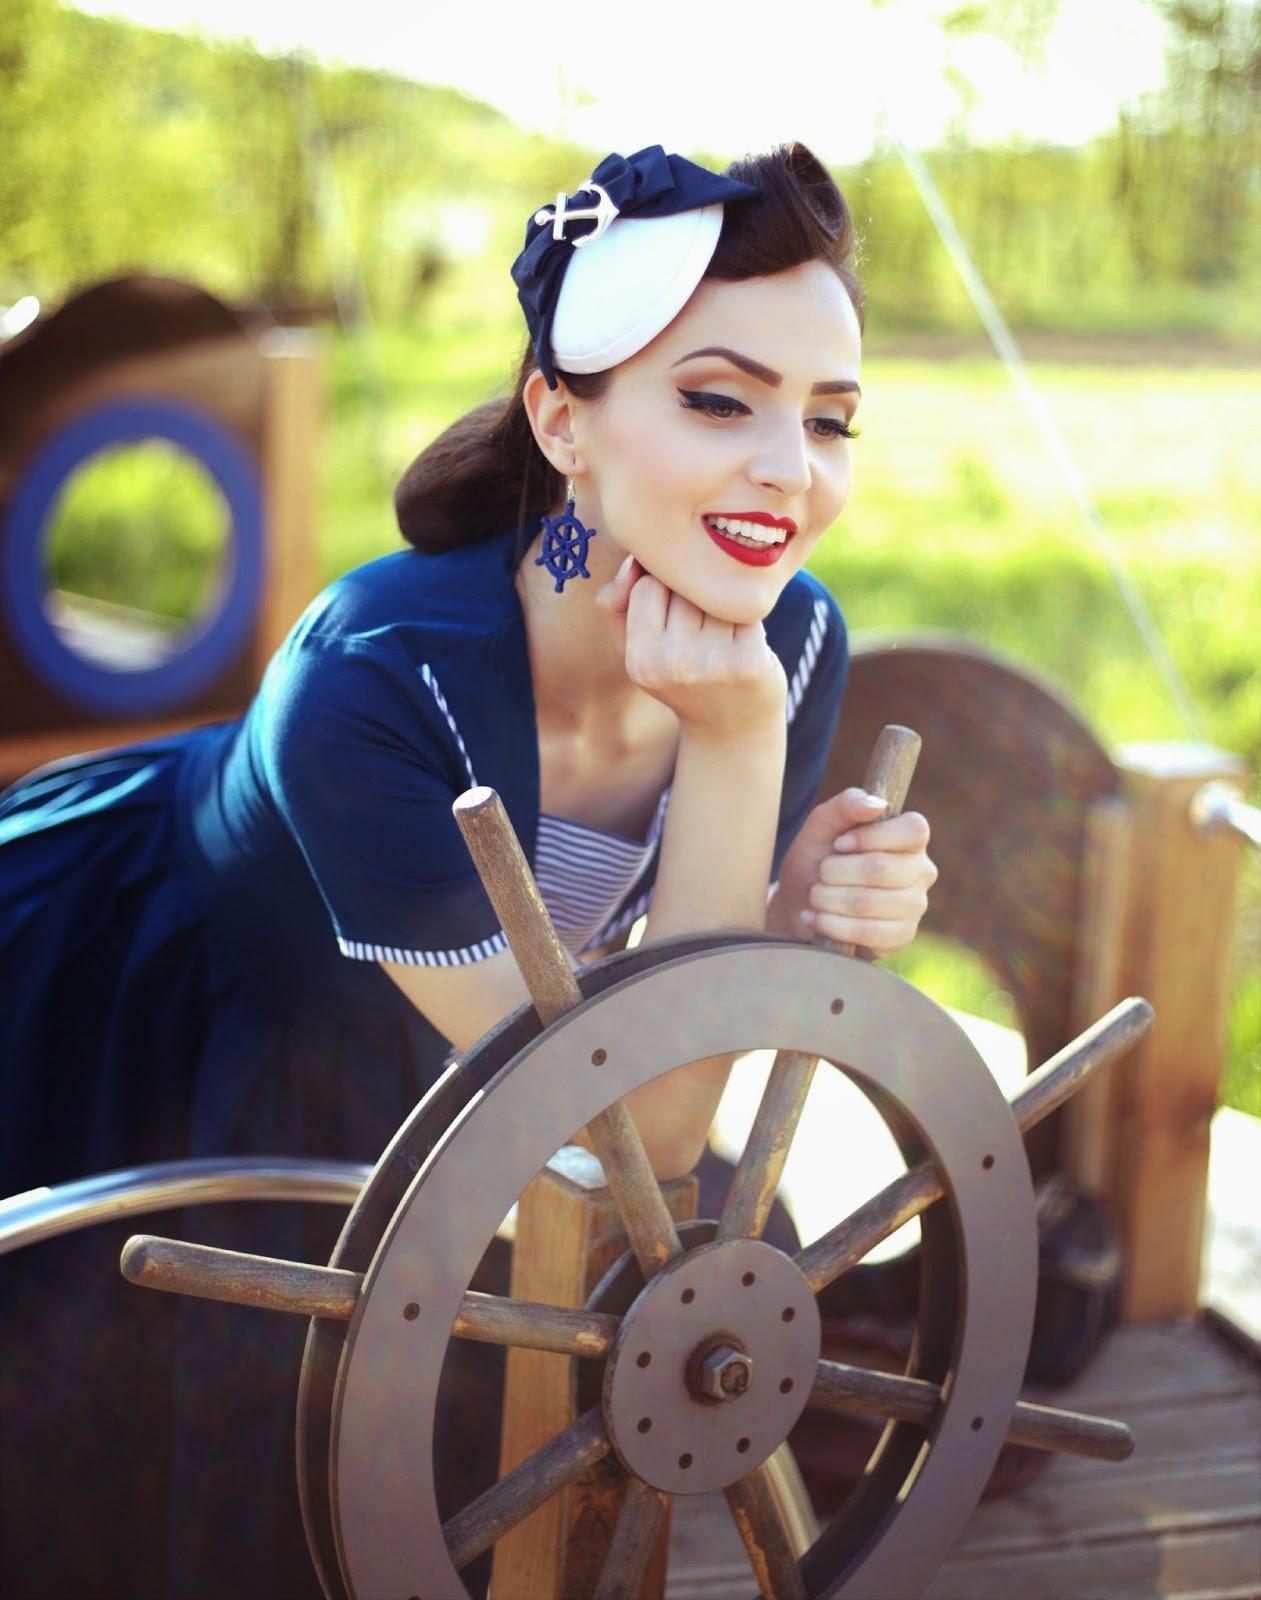 Idda Van Munster: I ♥ Daisy Dapper